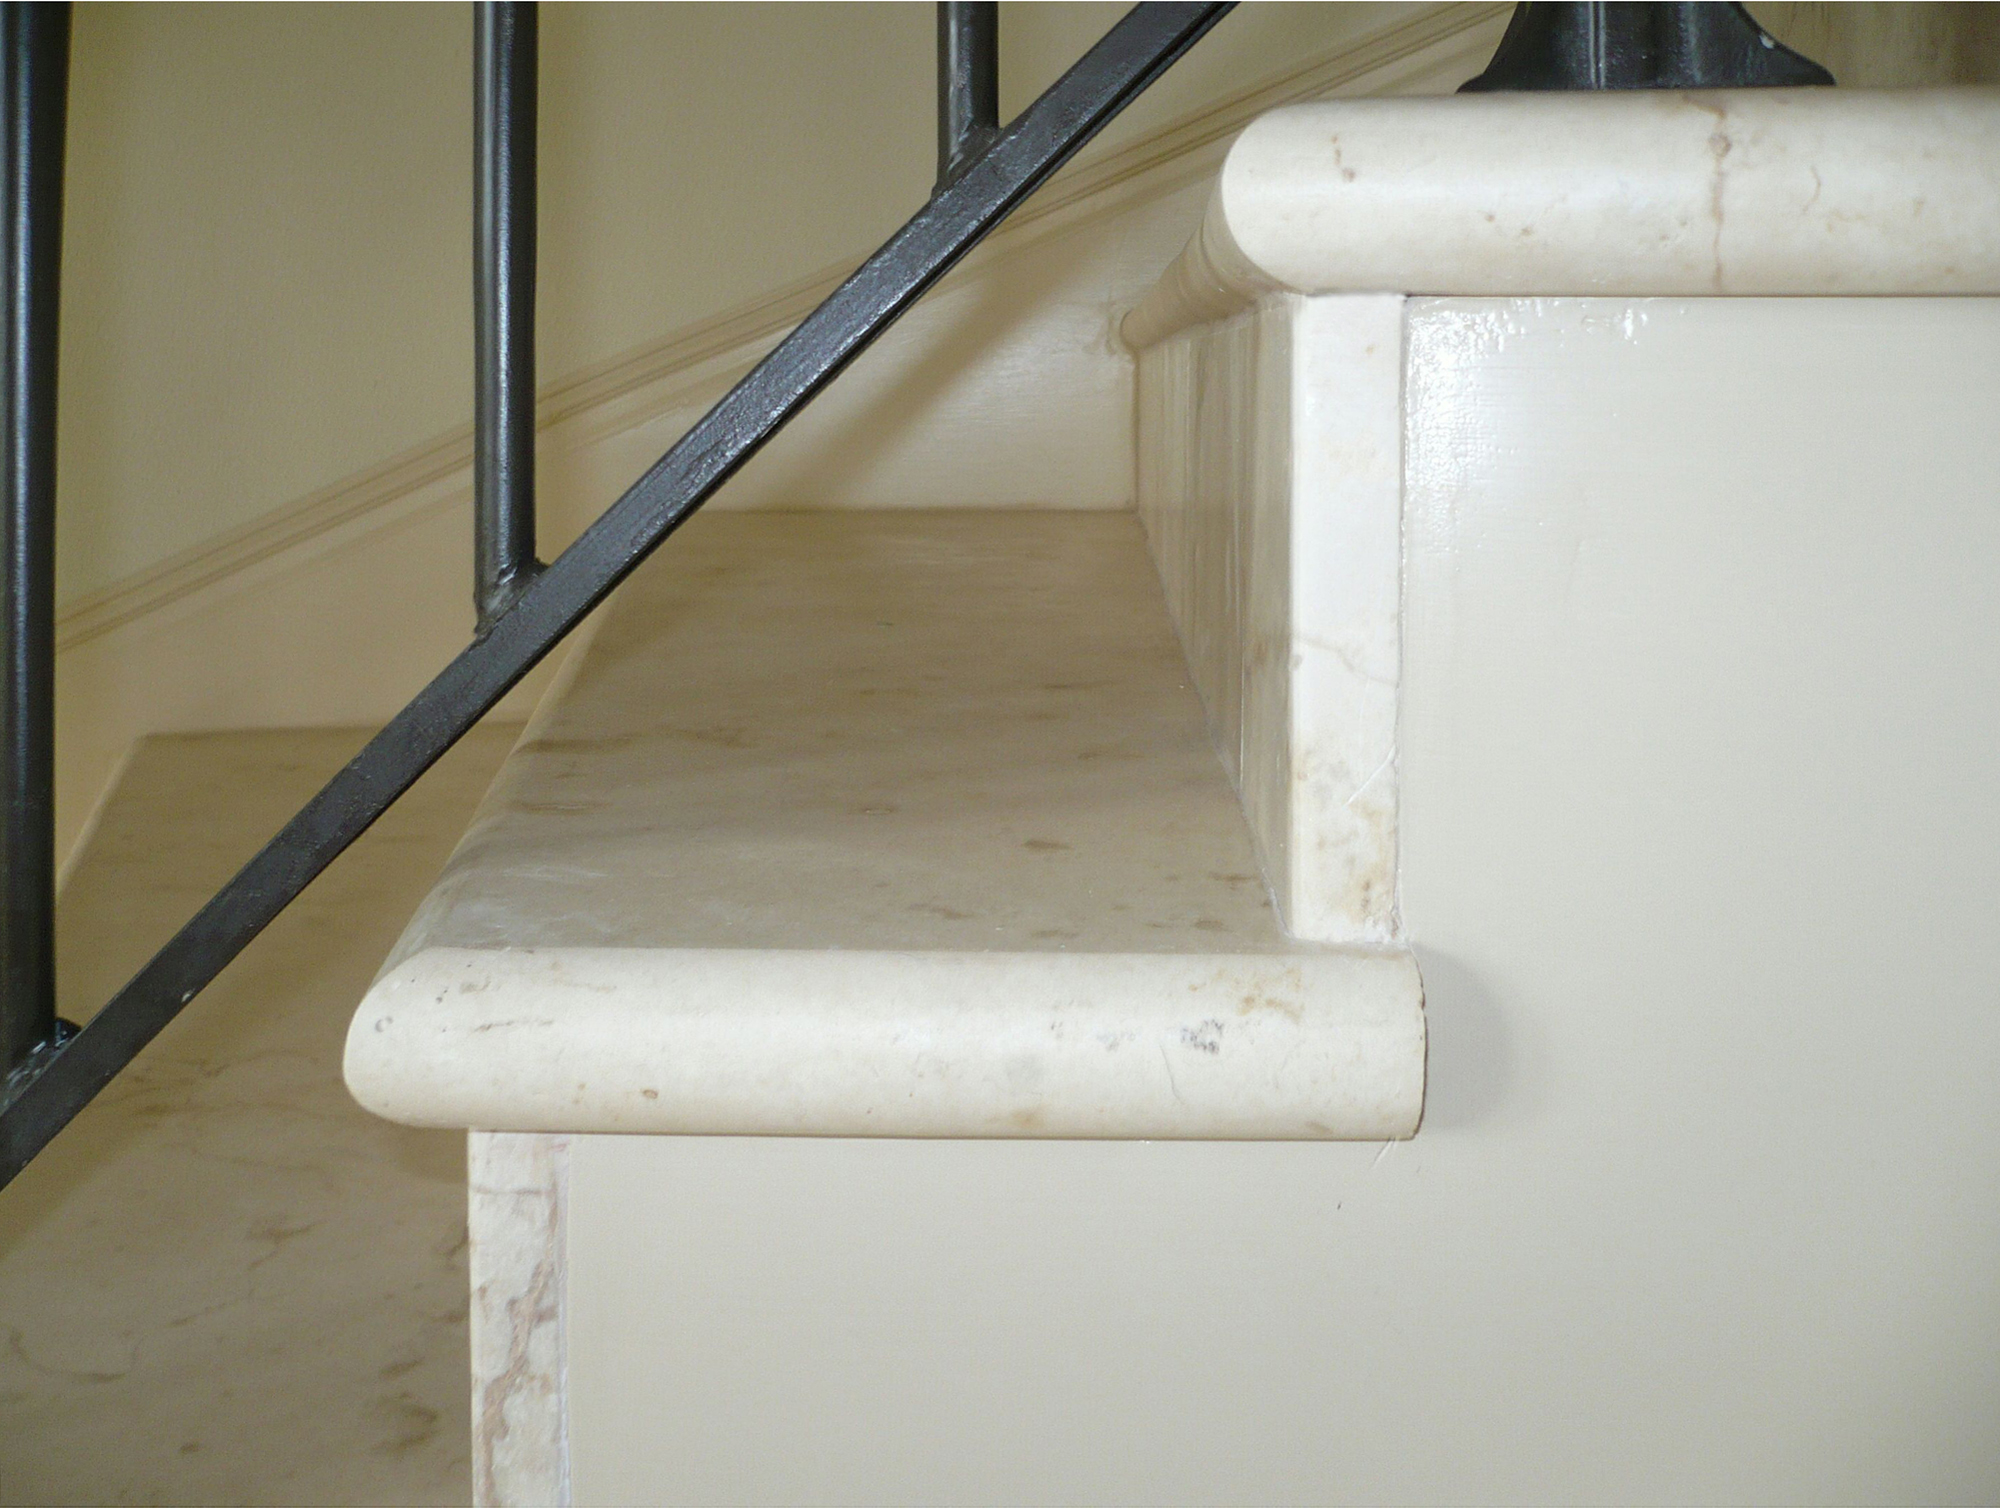 BF_Stairsdetail_1508x2000_2007.6.20_0056.jpg